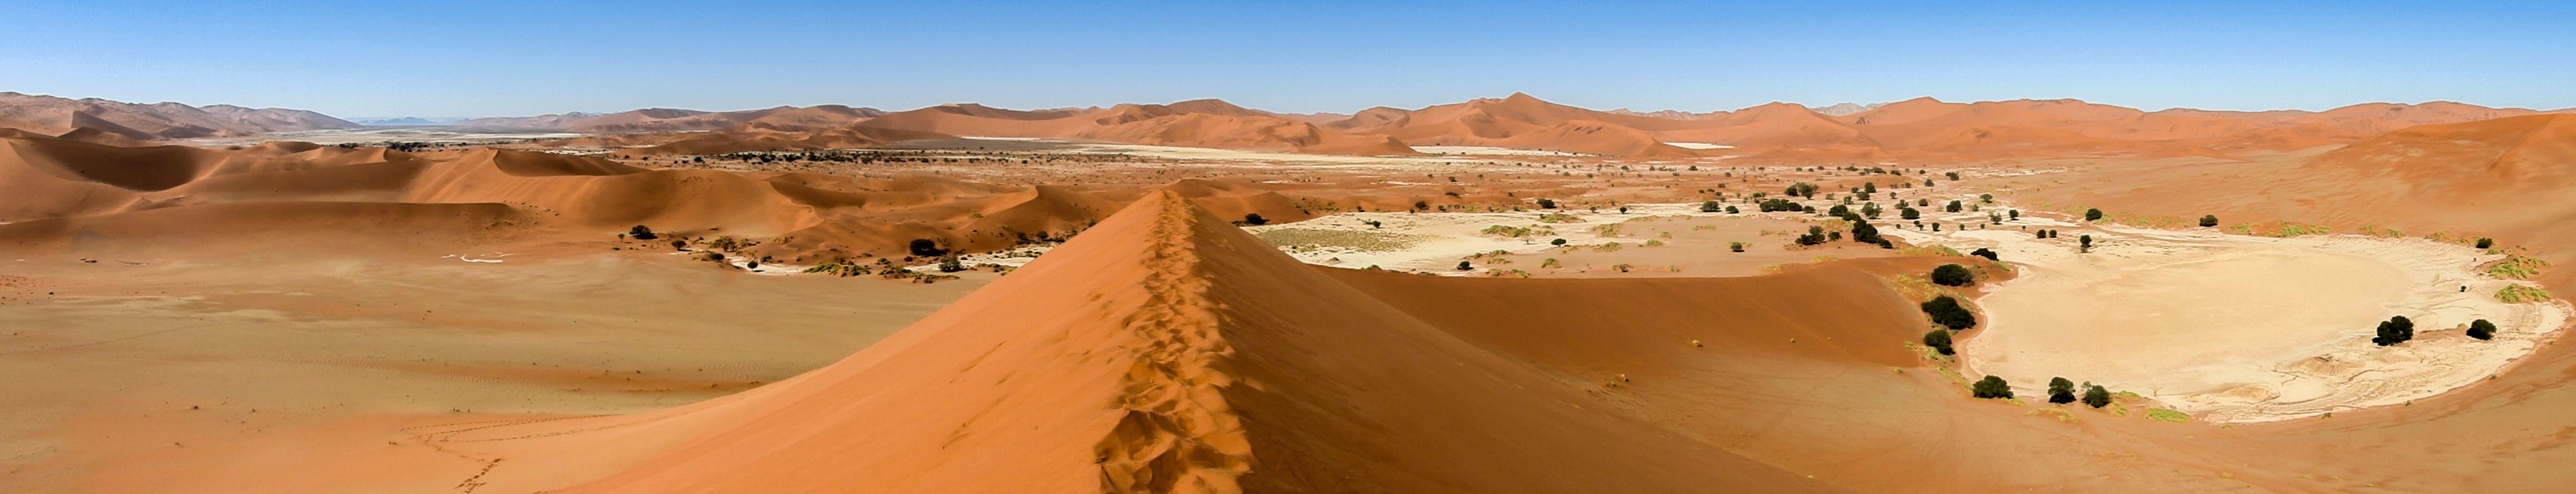 Namibia-Sossusvlei-01